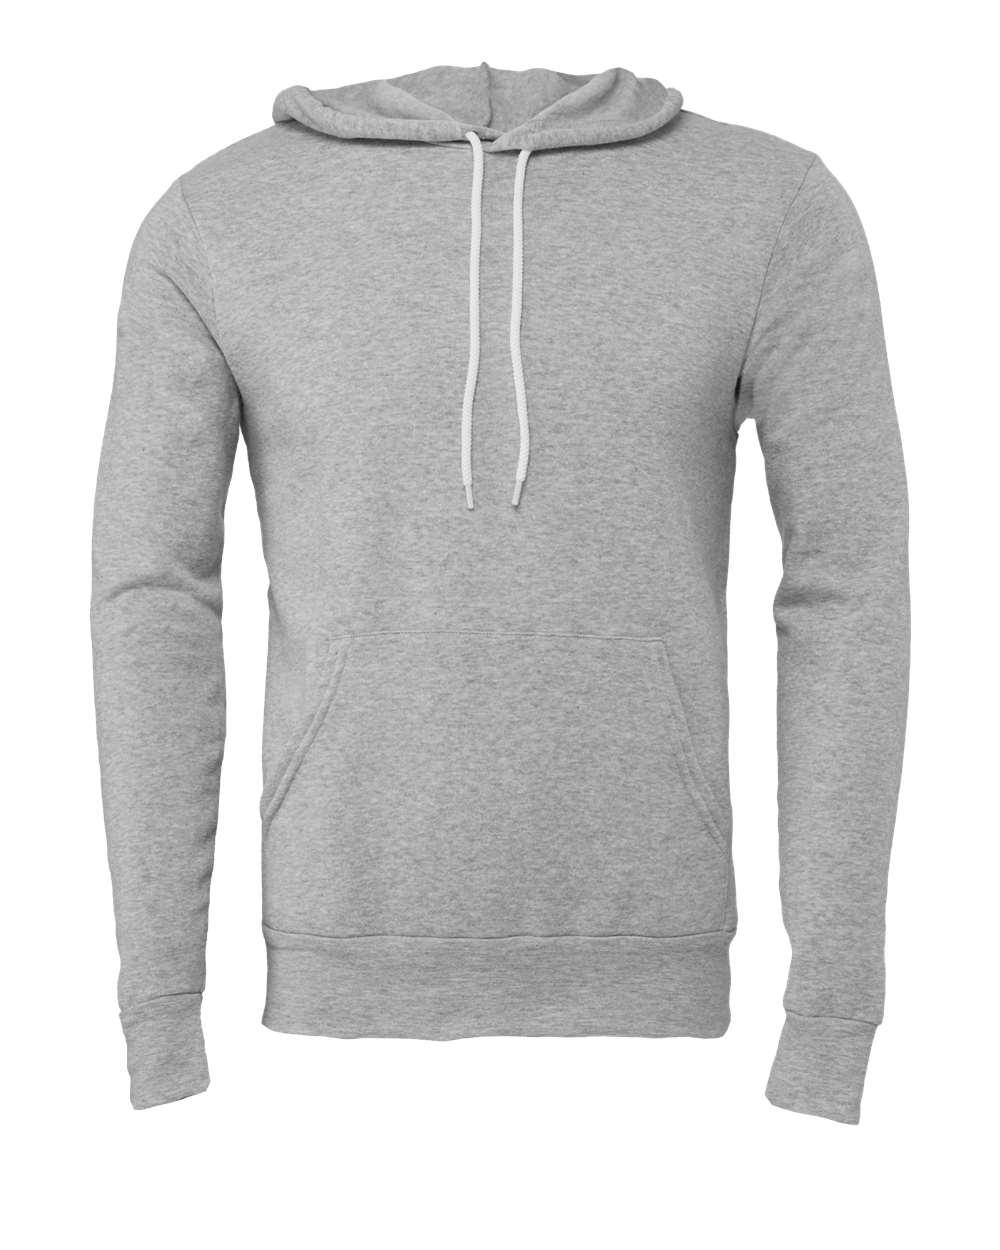 Bella-Canvas-Unisex-Sponge-Hooded-Pullover-Sweatshirt-Blank-3719-up-to-2XL thumbnail 8